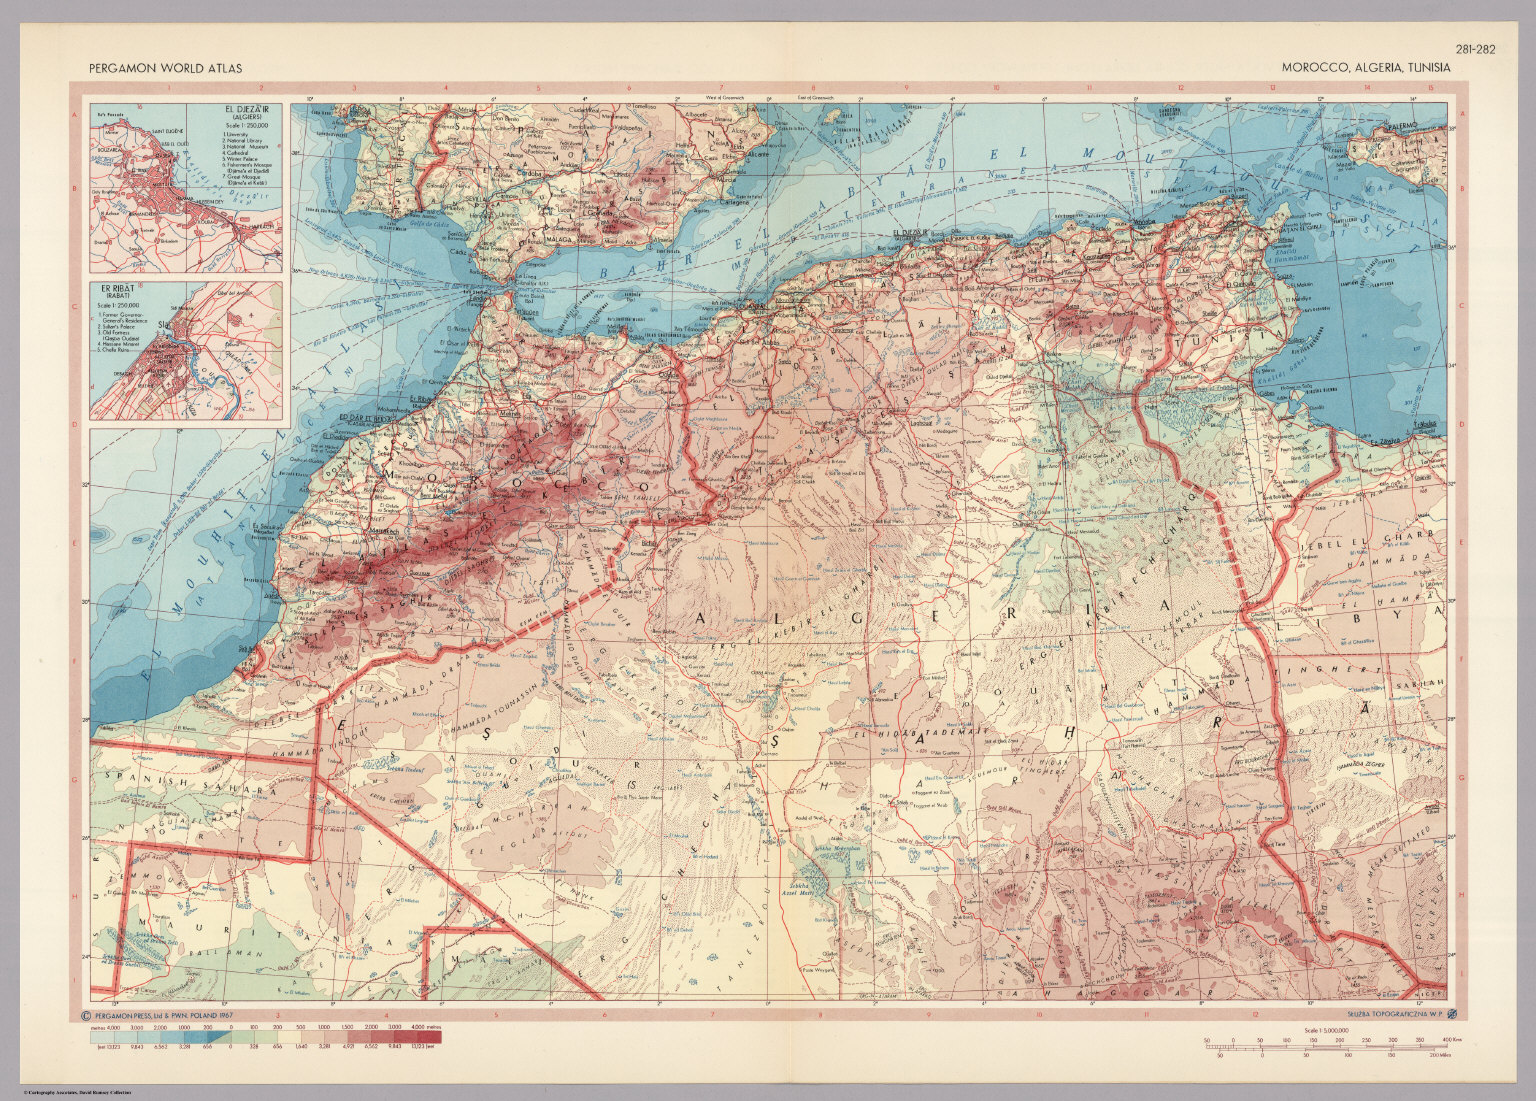 Morocco algeria tunisia pergamon world atlas david rumsey morocco algeria tunisia pergamon world atlas gumiabroncs Image collections